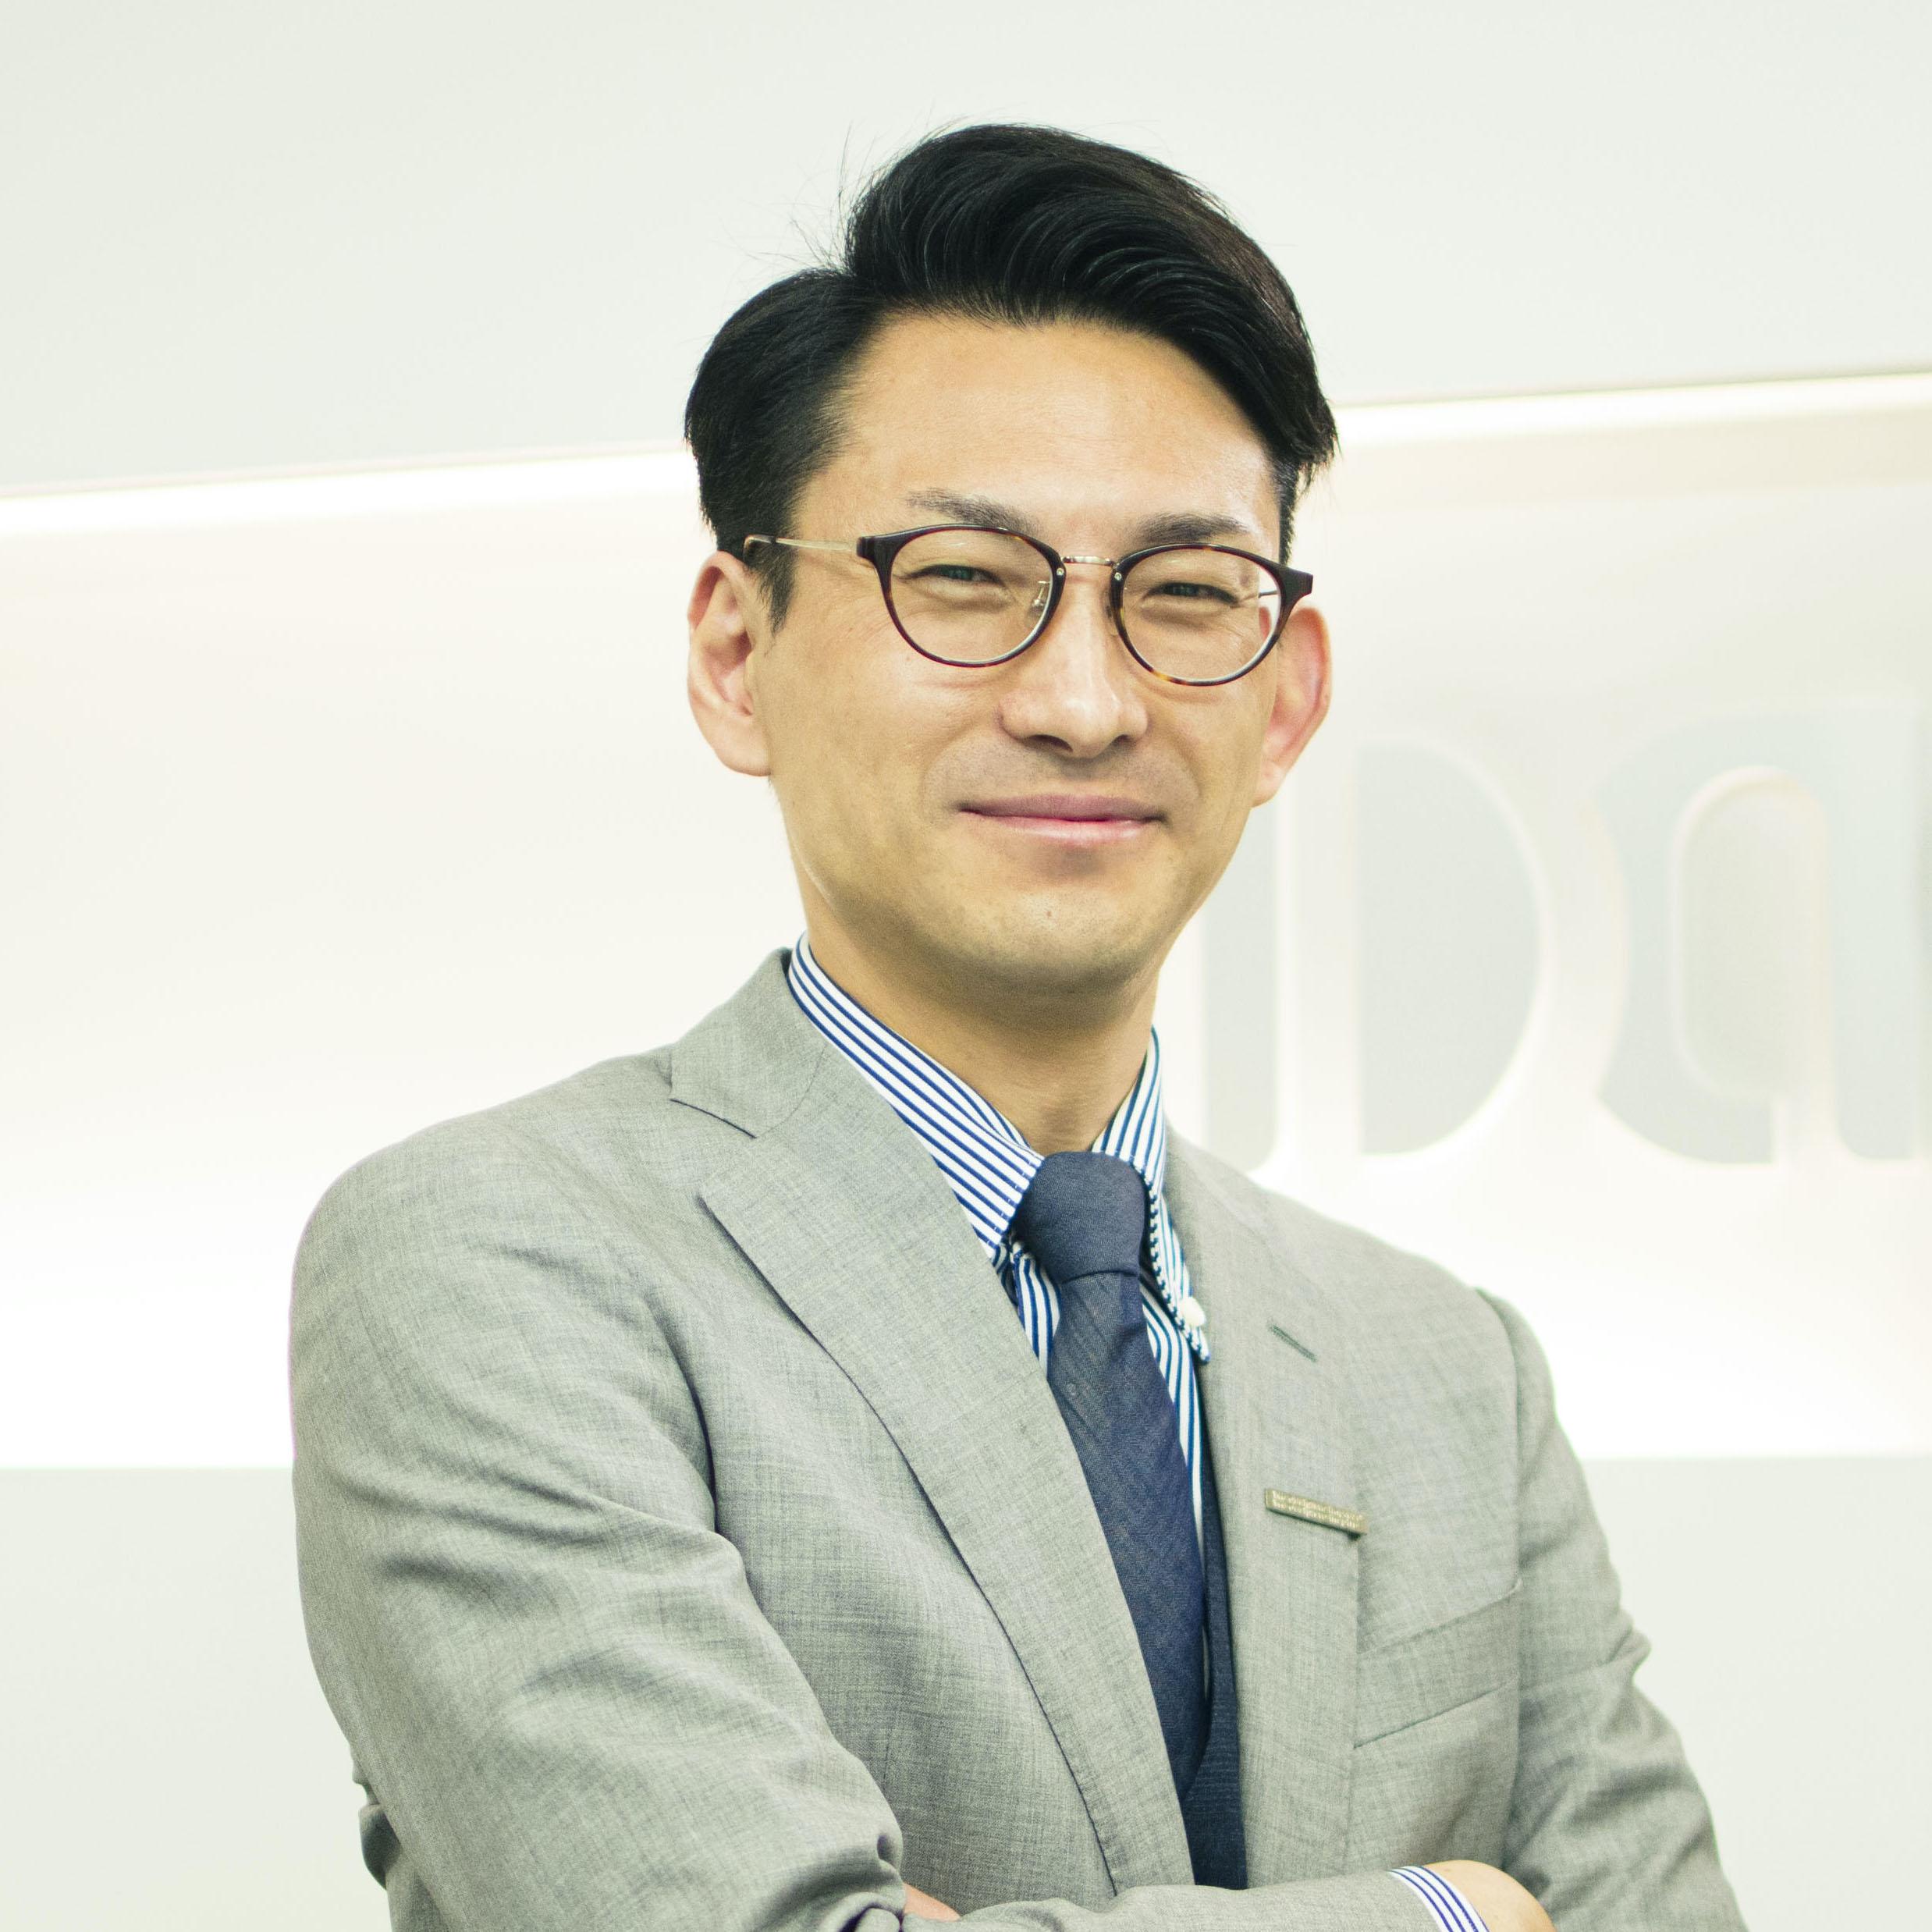 Satoru Kobayashi